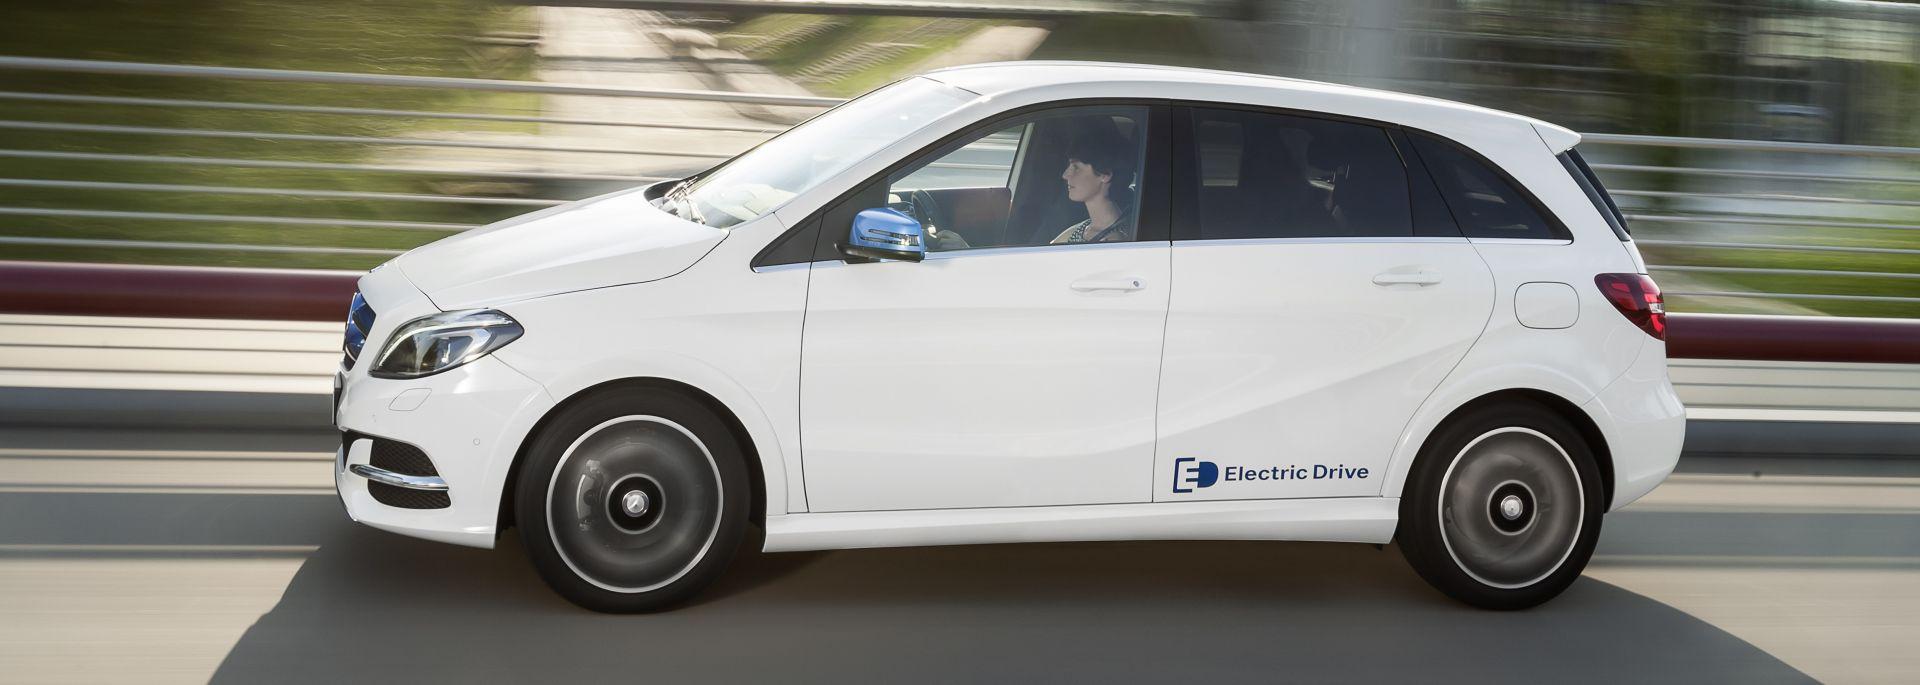 Mercedes benz b klasse electric drive lueg for B service mercedes benz